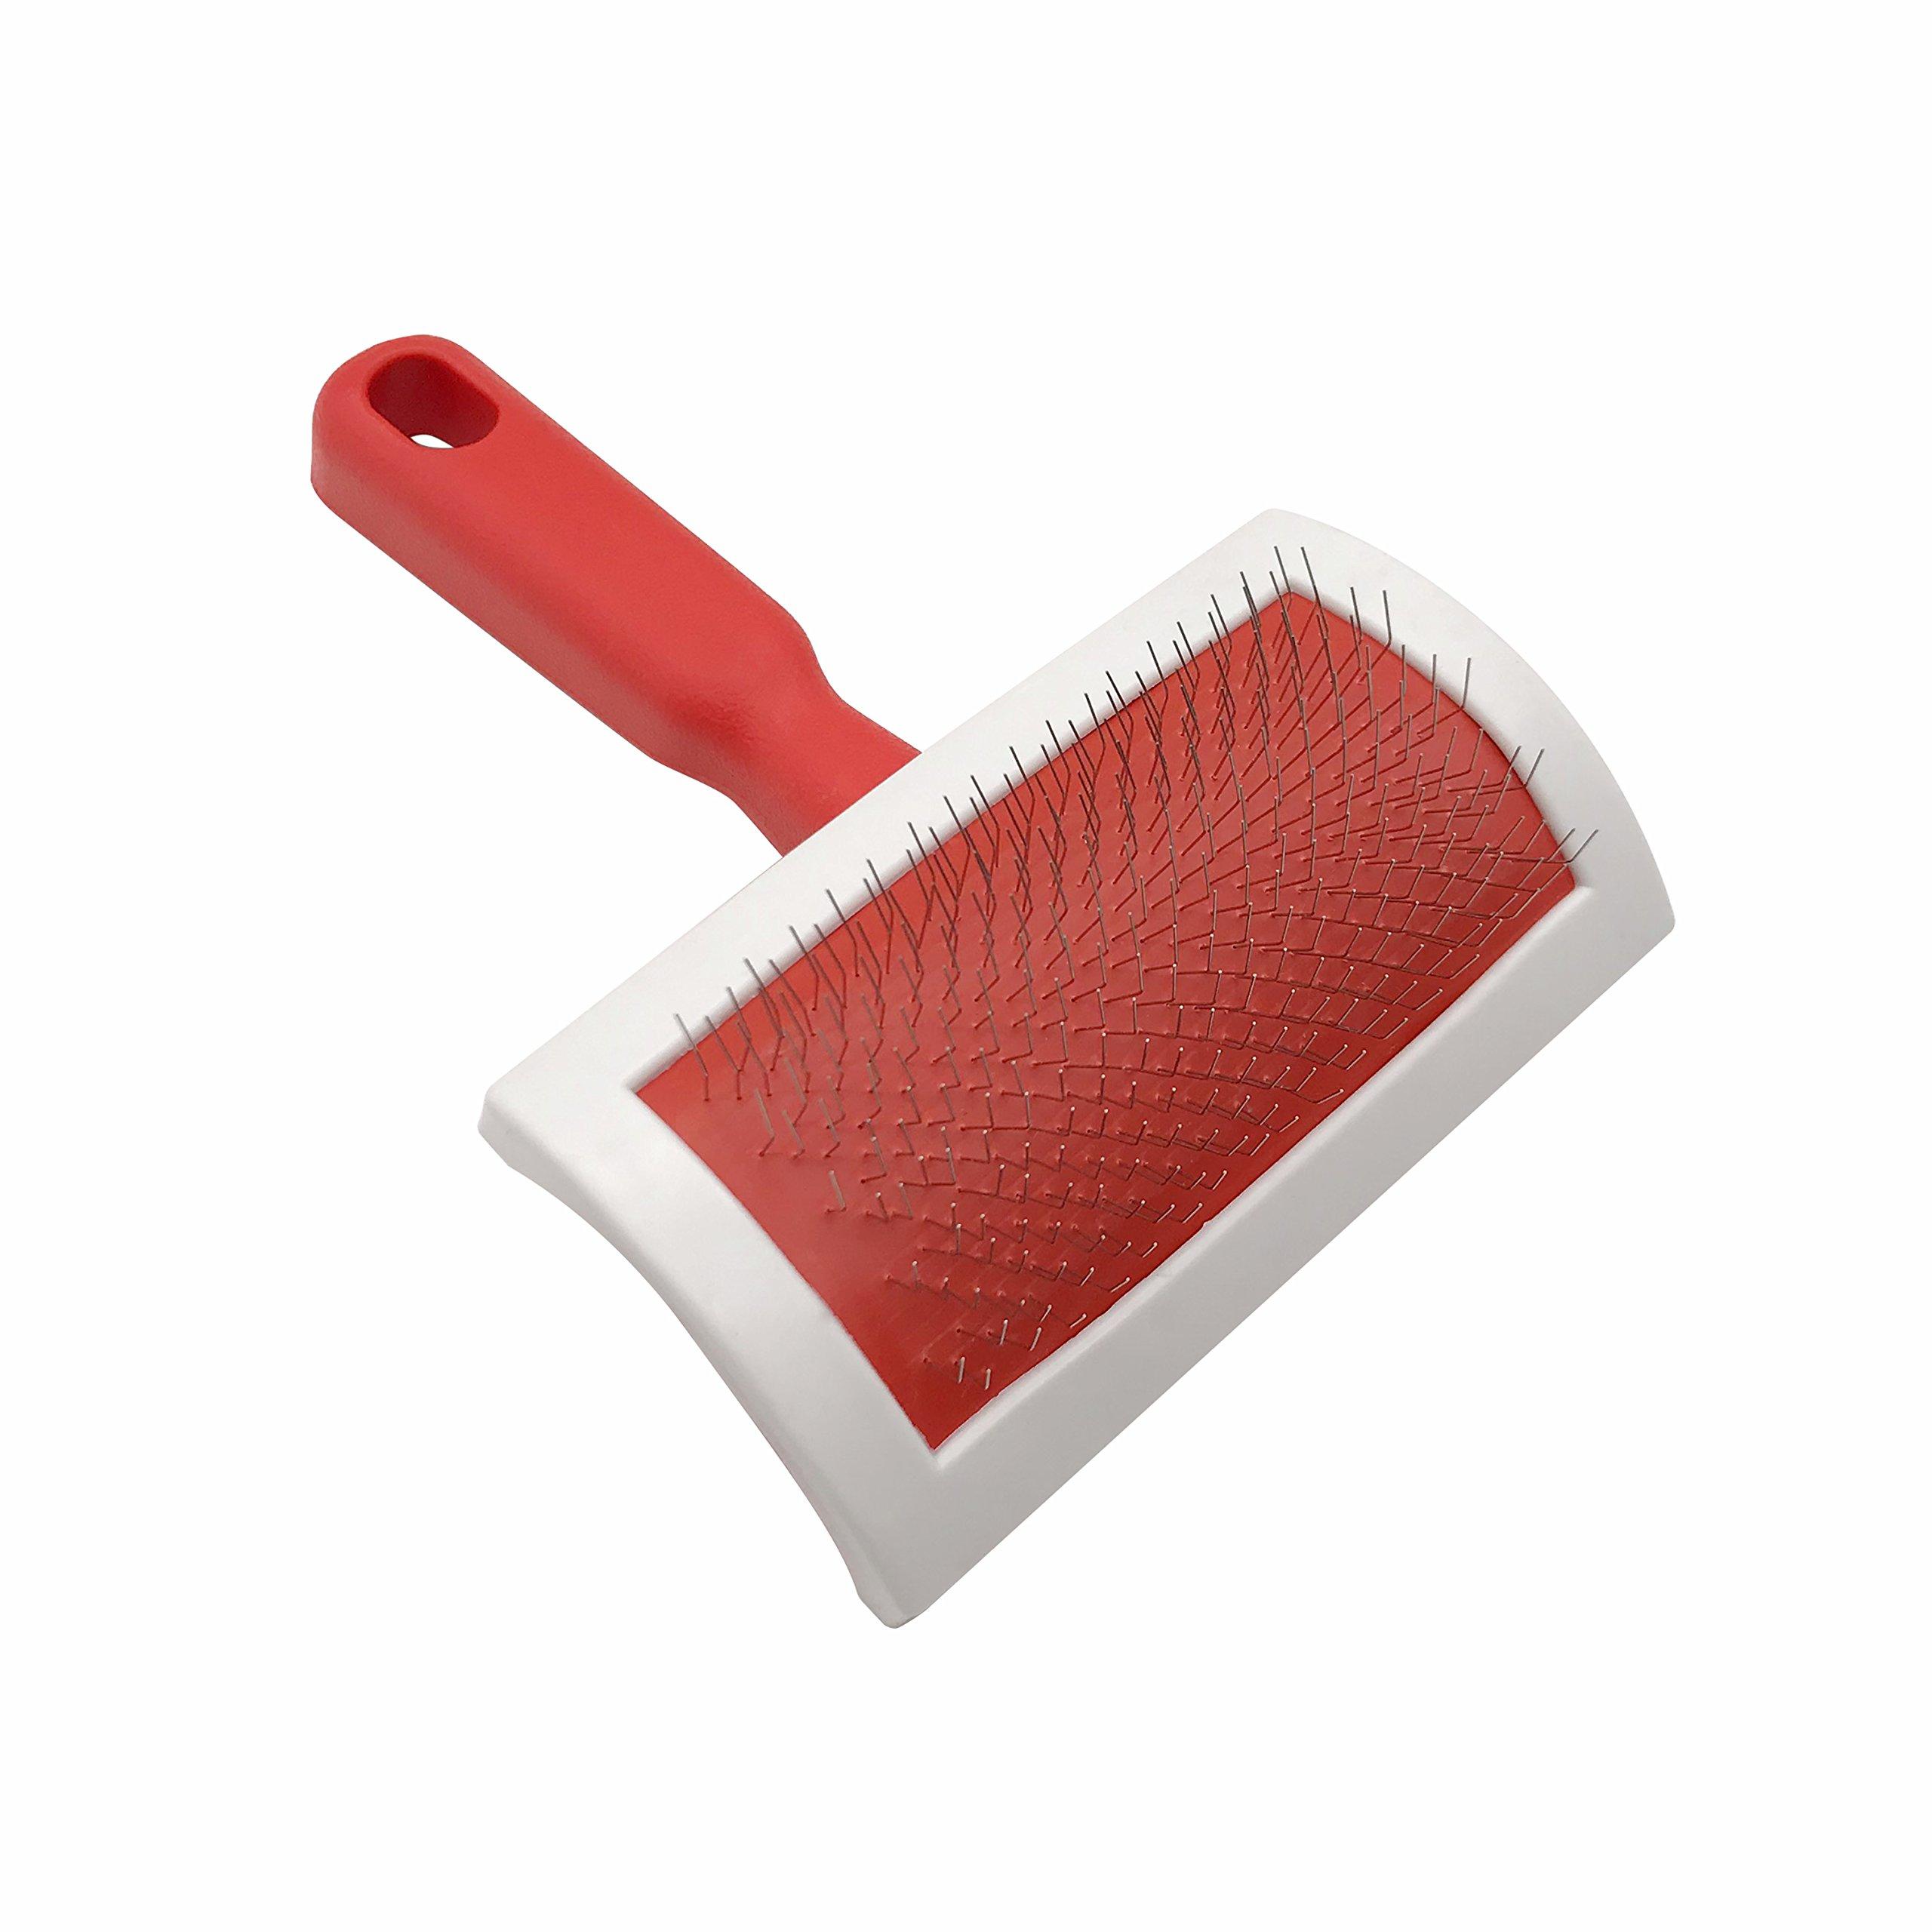 MEQI Fur Brush, Cleaning Brush for Rug, Sheepskin Fur Rug, Coats